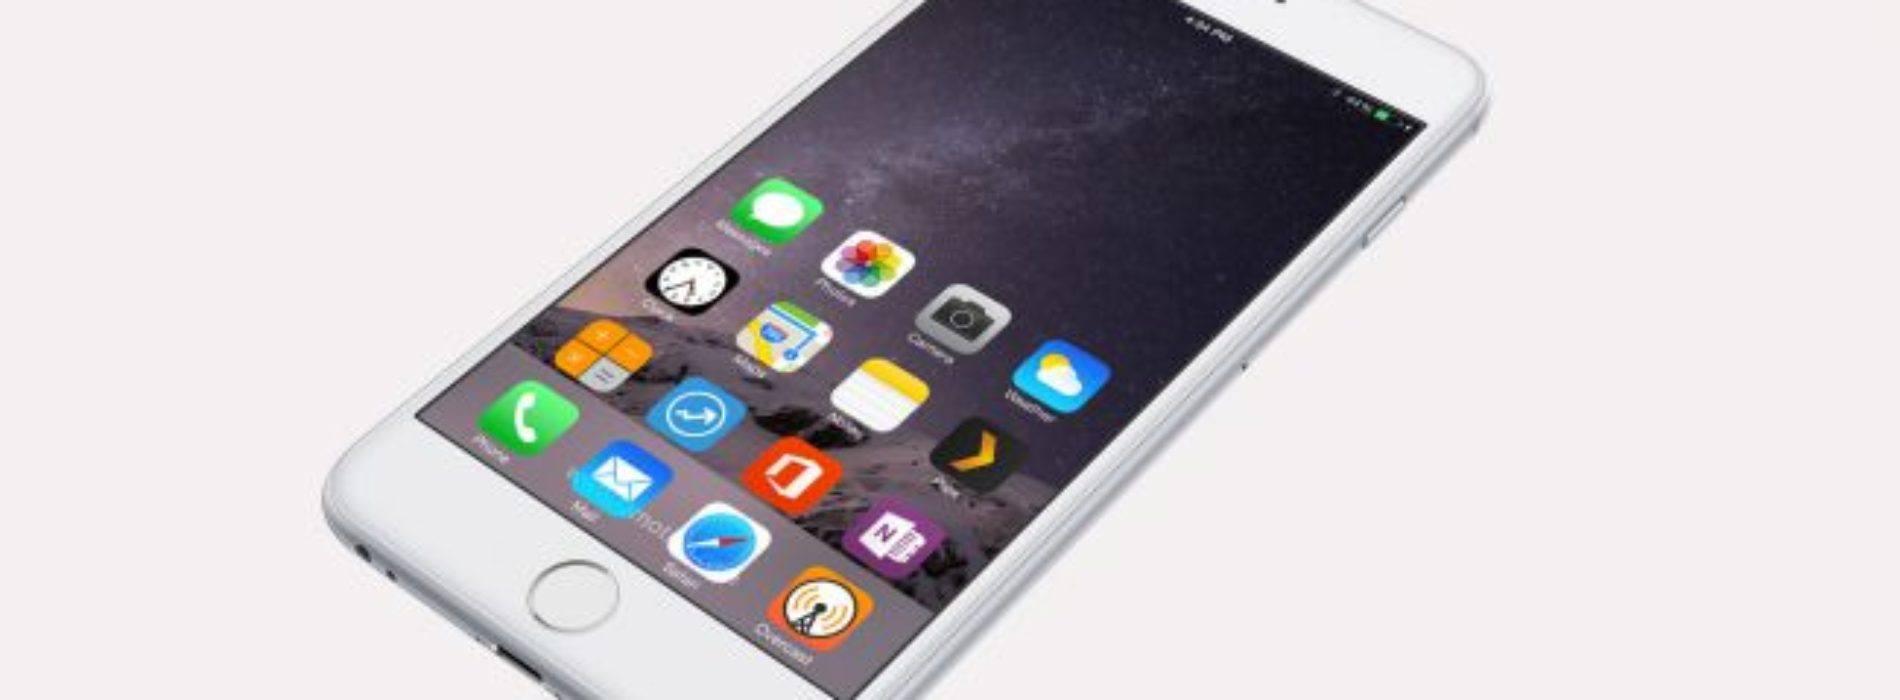 Top 6 innovaciones del iPhone 7